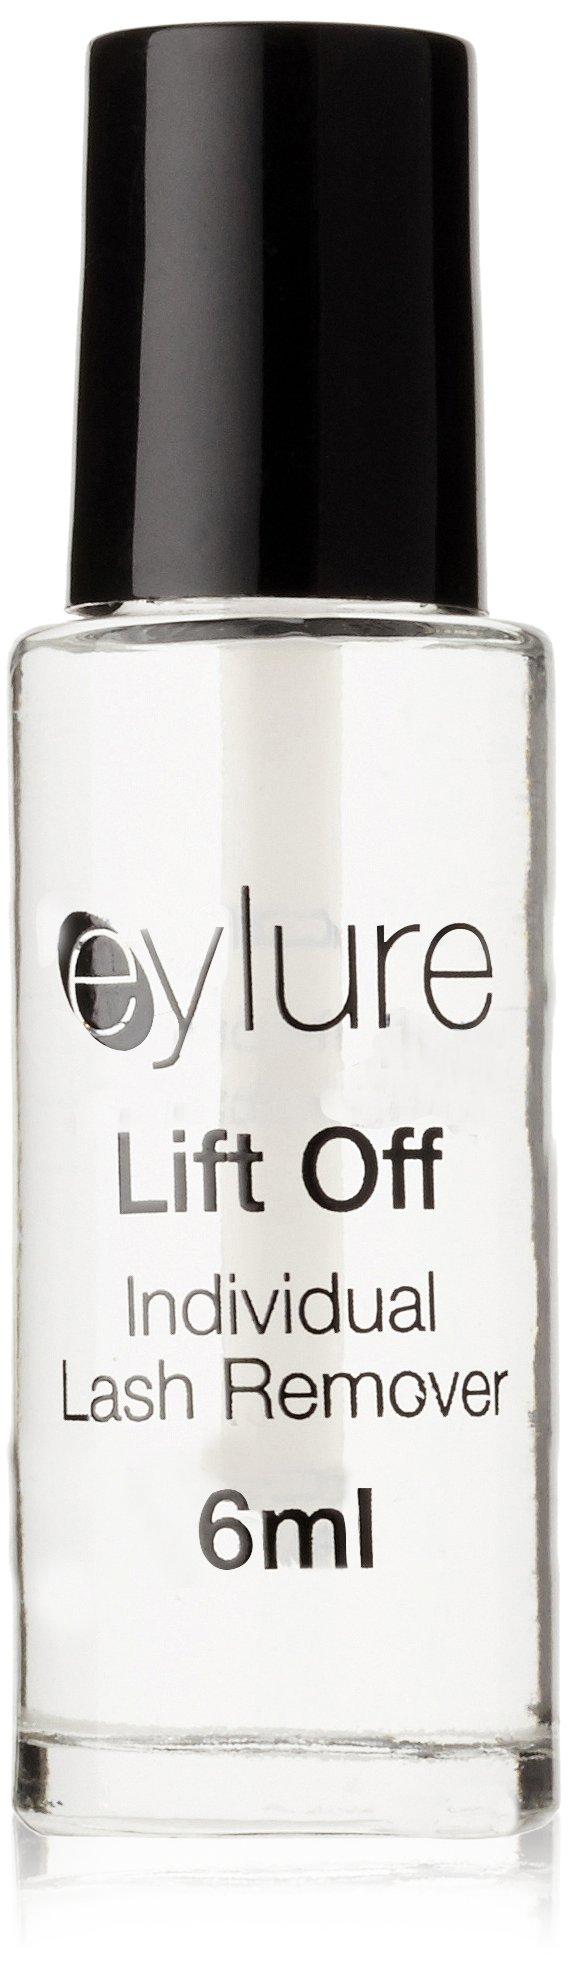 0e488477b32 Eylure Liftoff 6ml Individual Lash Remover   eBay